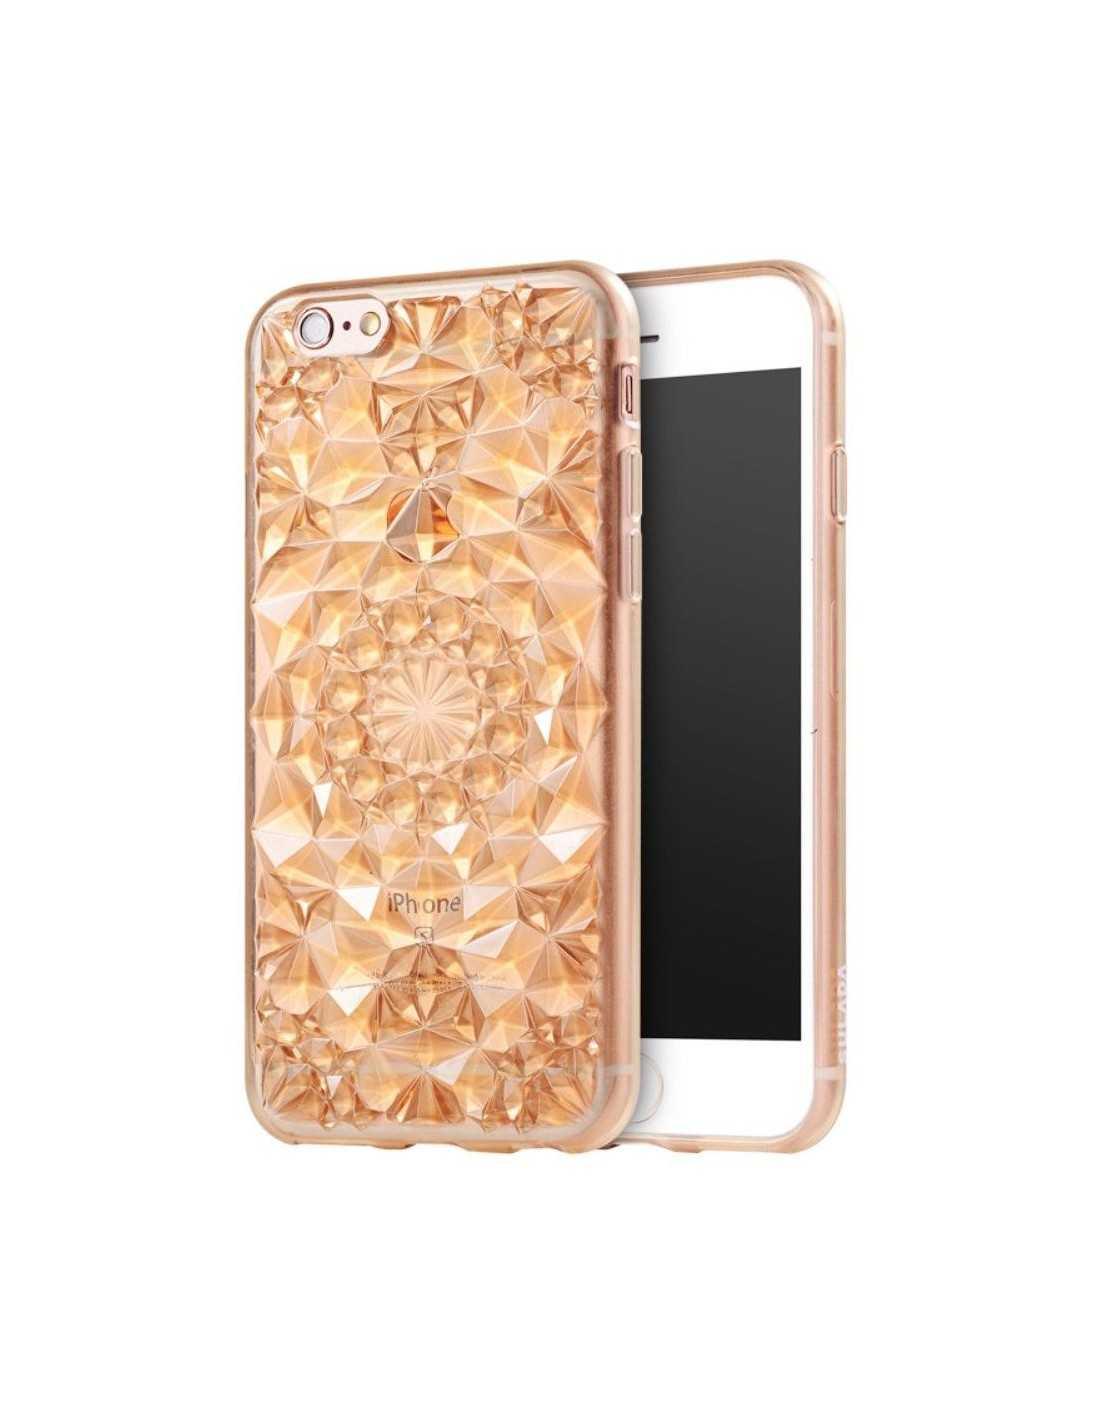 coque iphone 6s 6 silicone 3d diamants